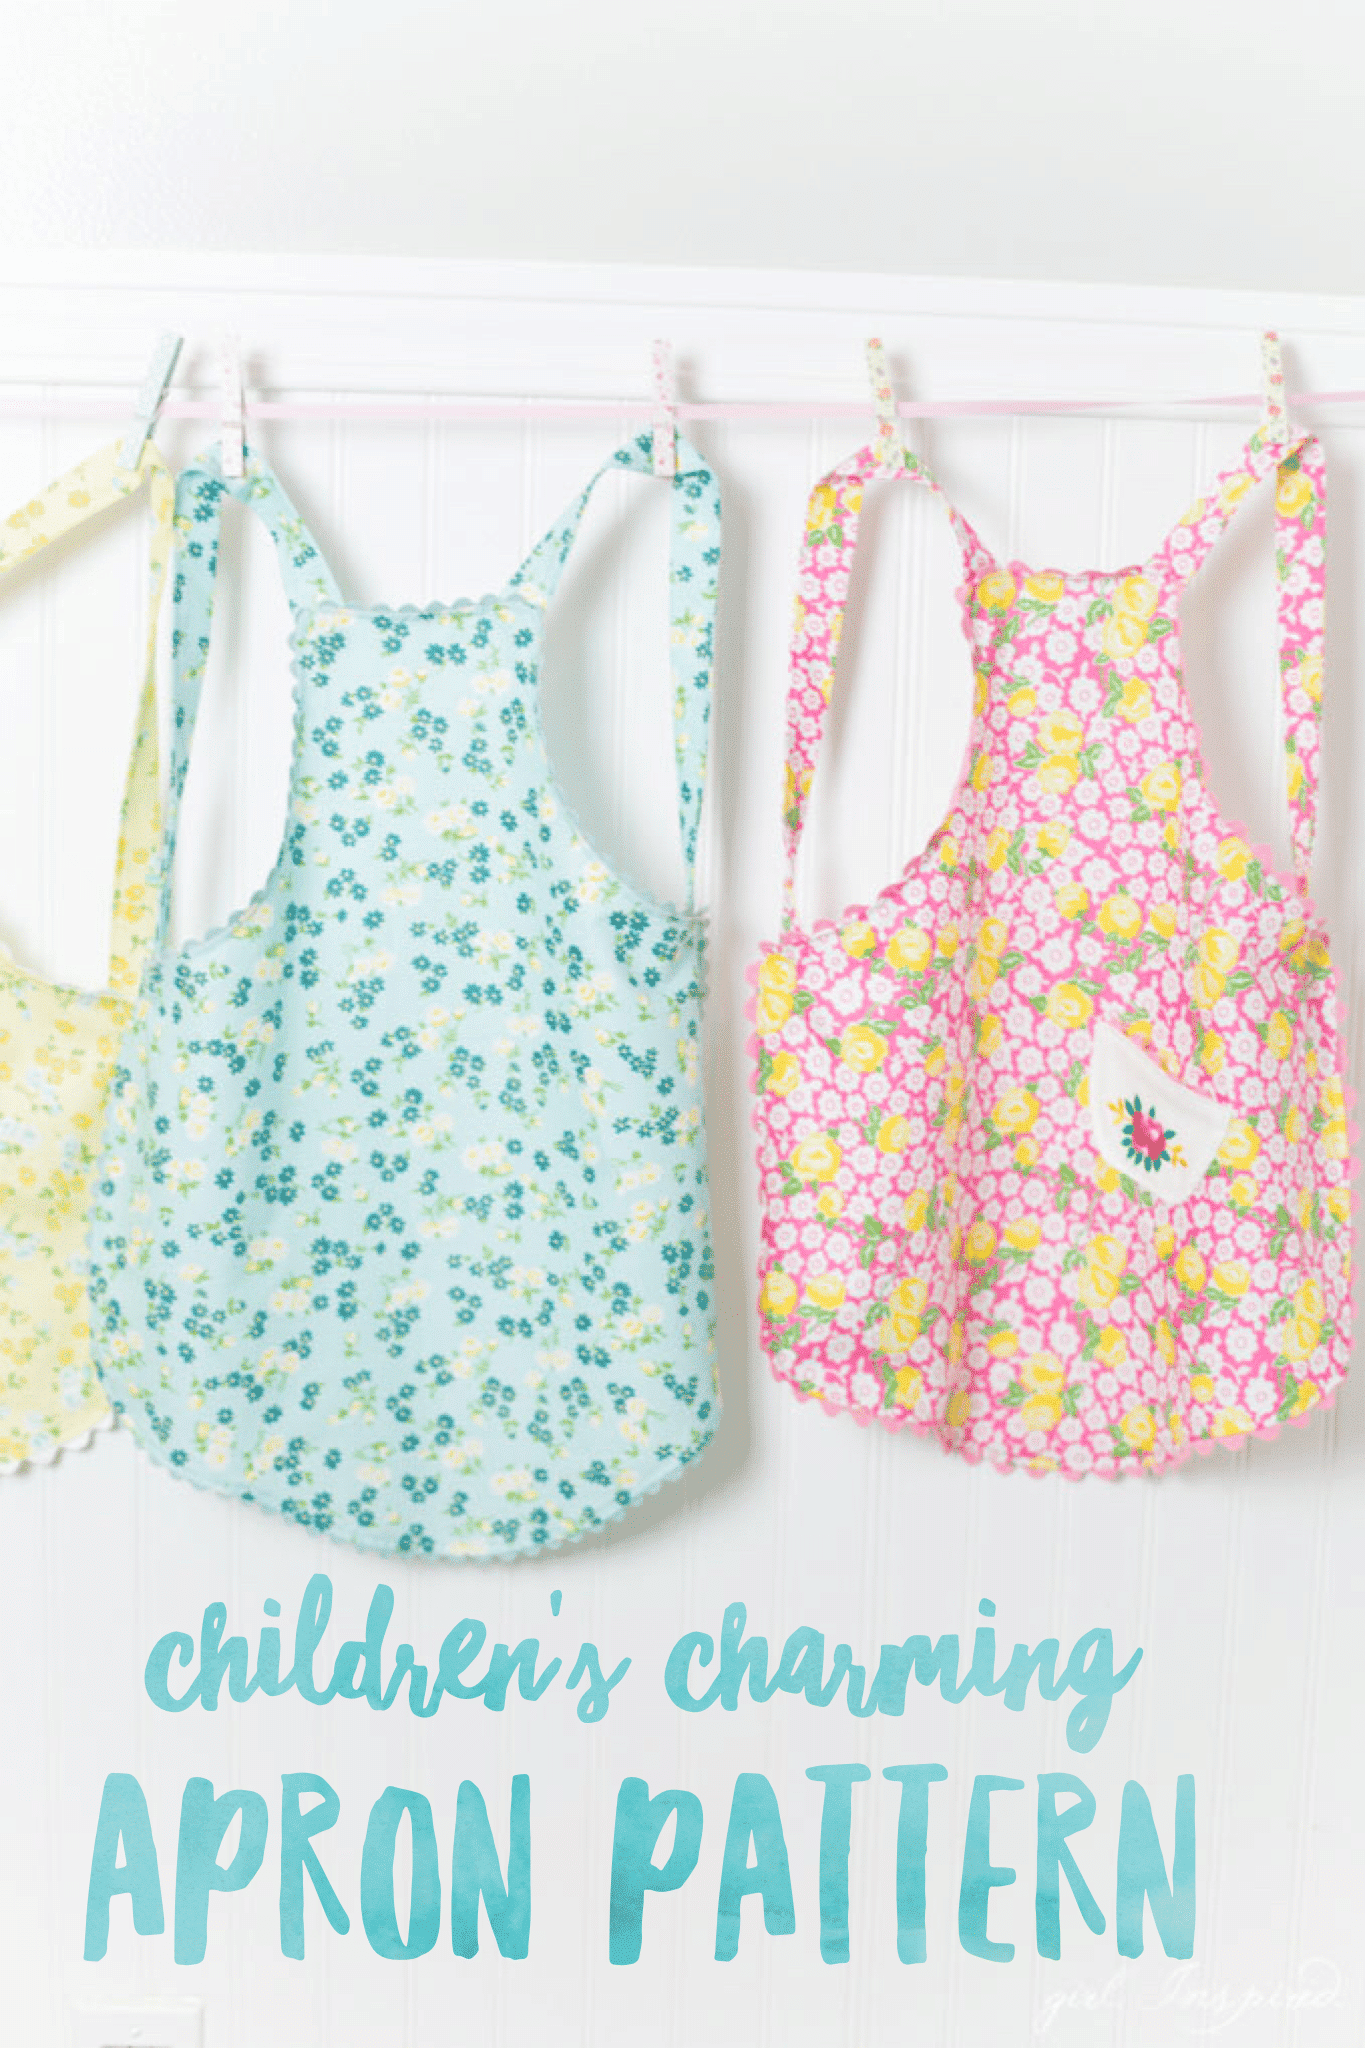 Children's Charming Apron Pattern